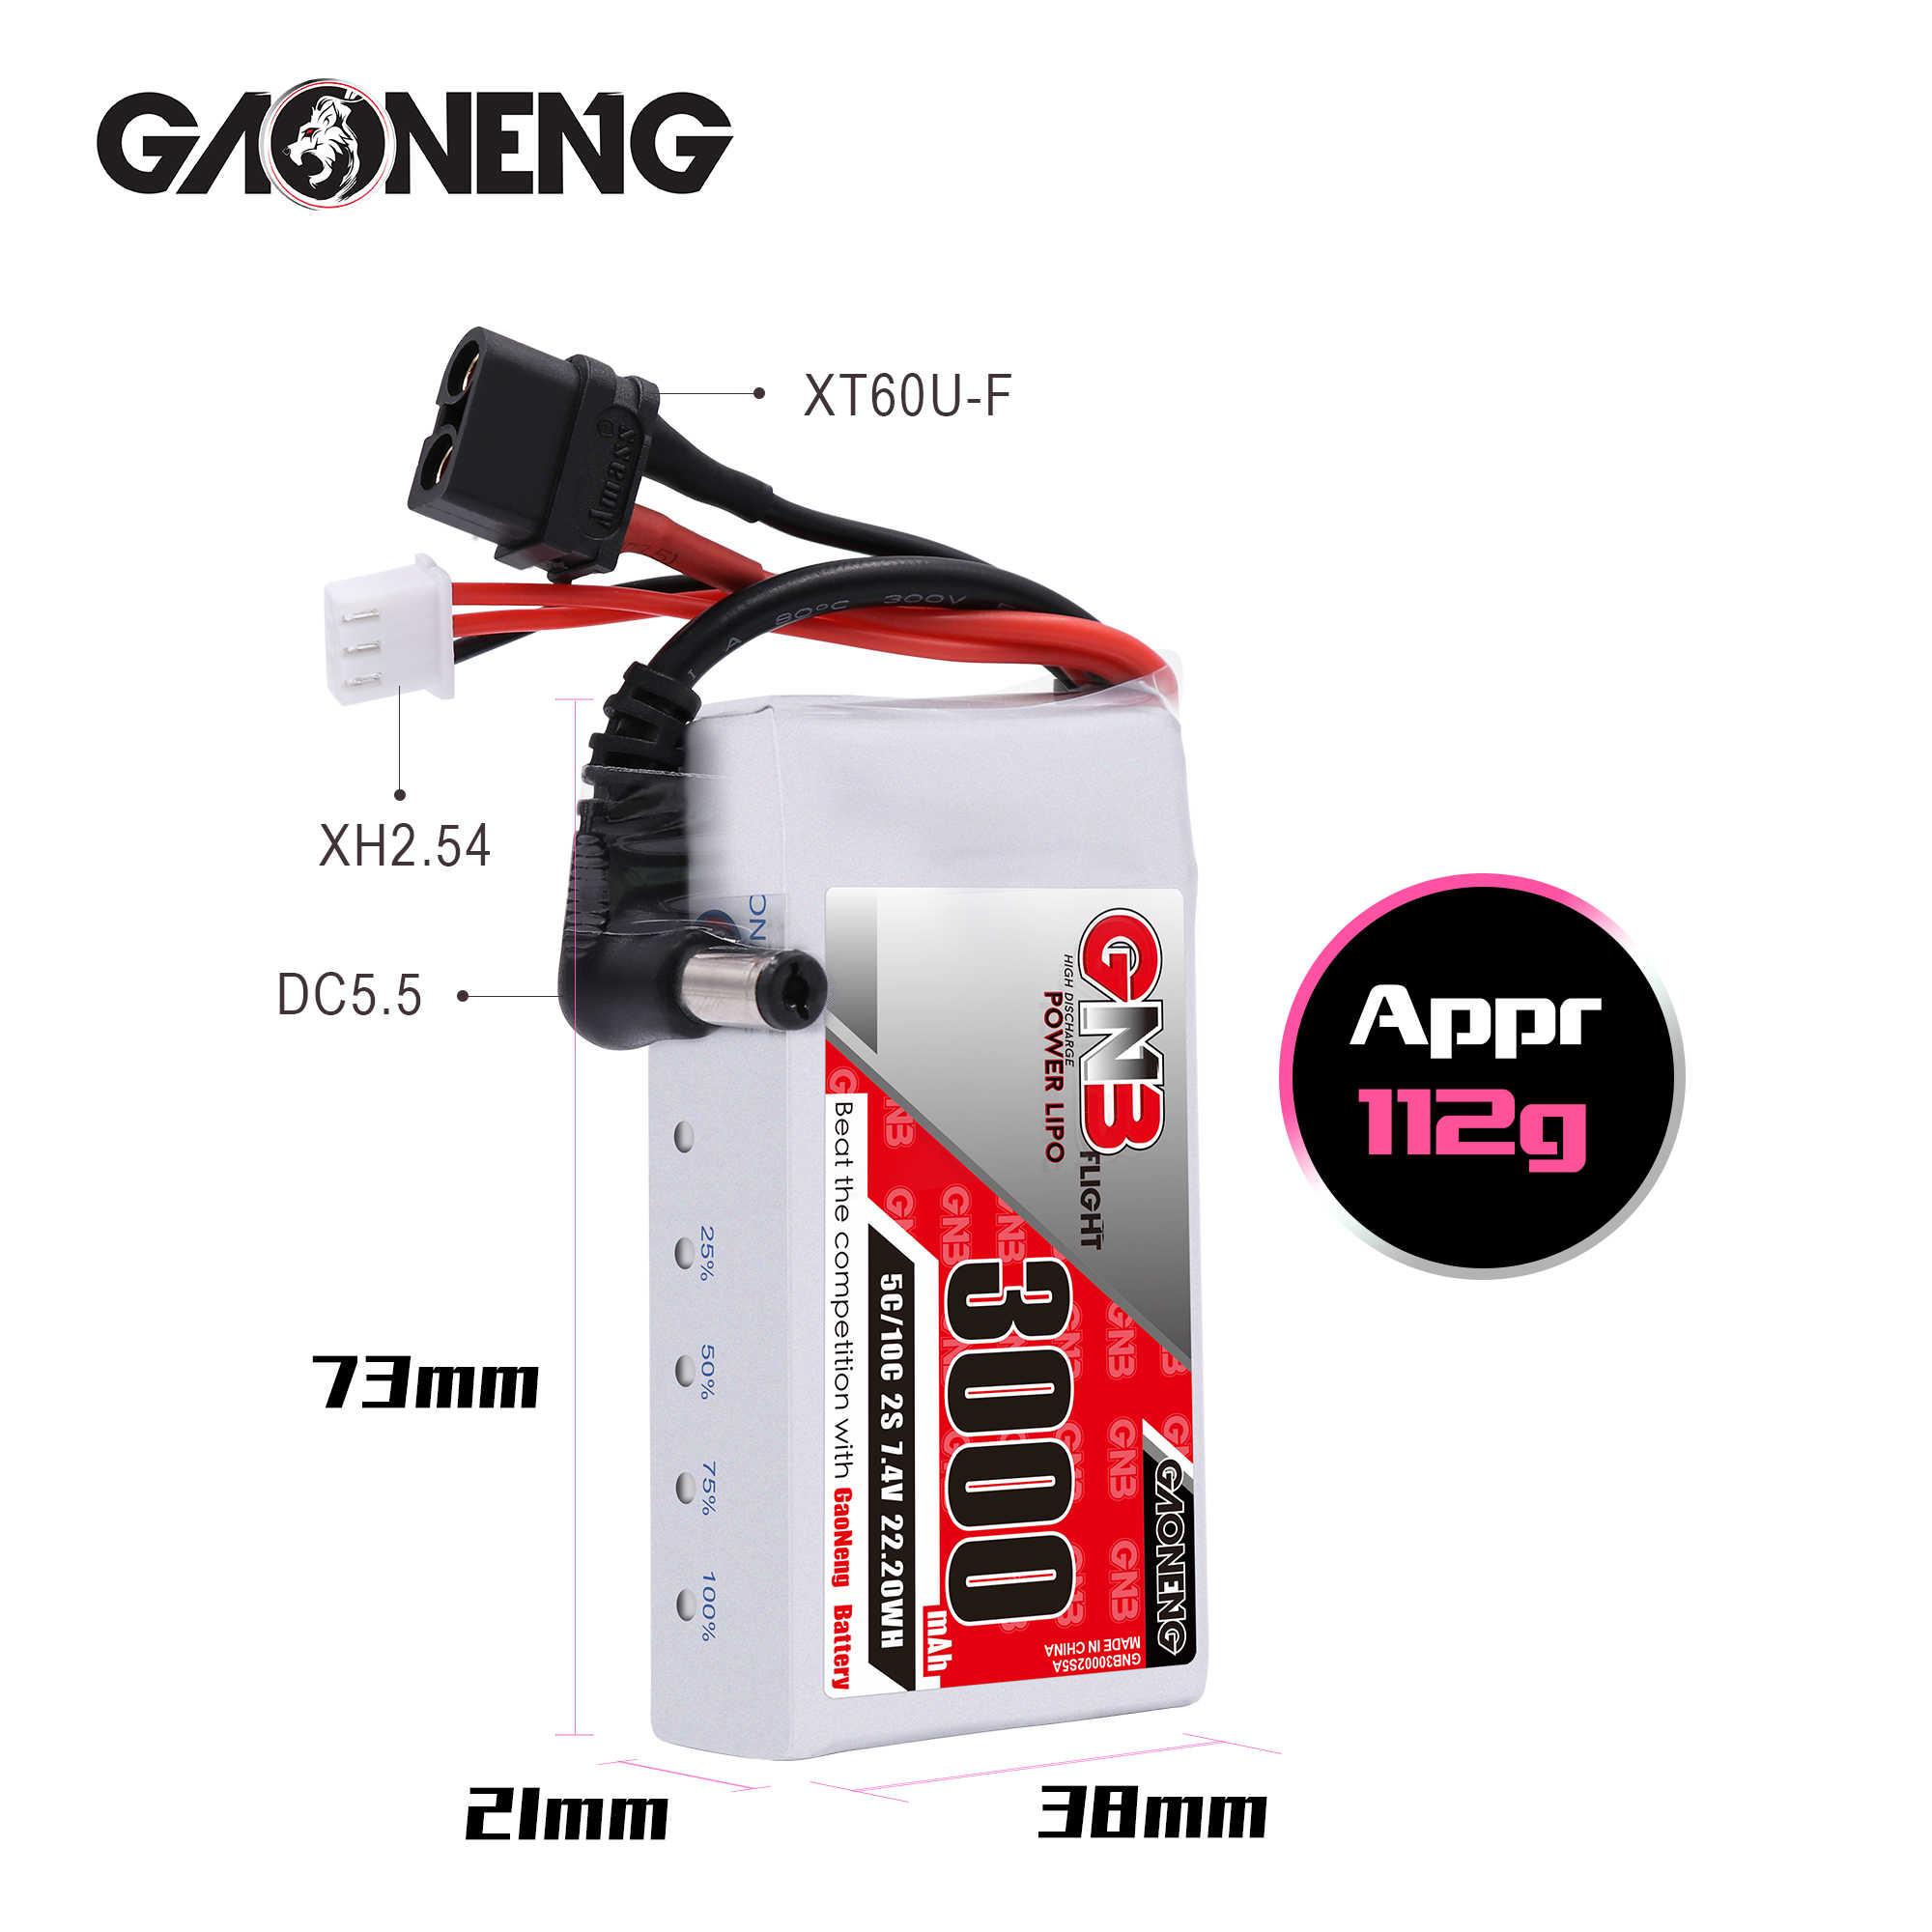 Gaoneng GNB 3000MAH 2 7,4 V 5C DC5.5mm XT60 gafas Lipo Indicador de energía de la batería para 0 Fatshark Dominator Skyzone Aomway RC Drone